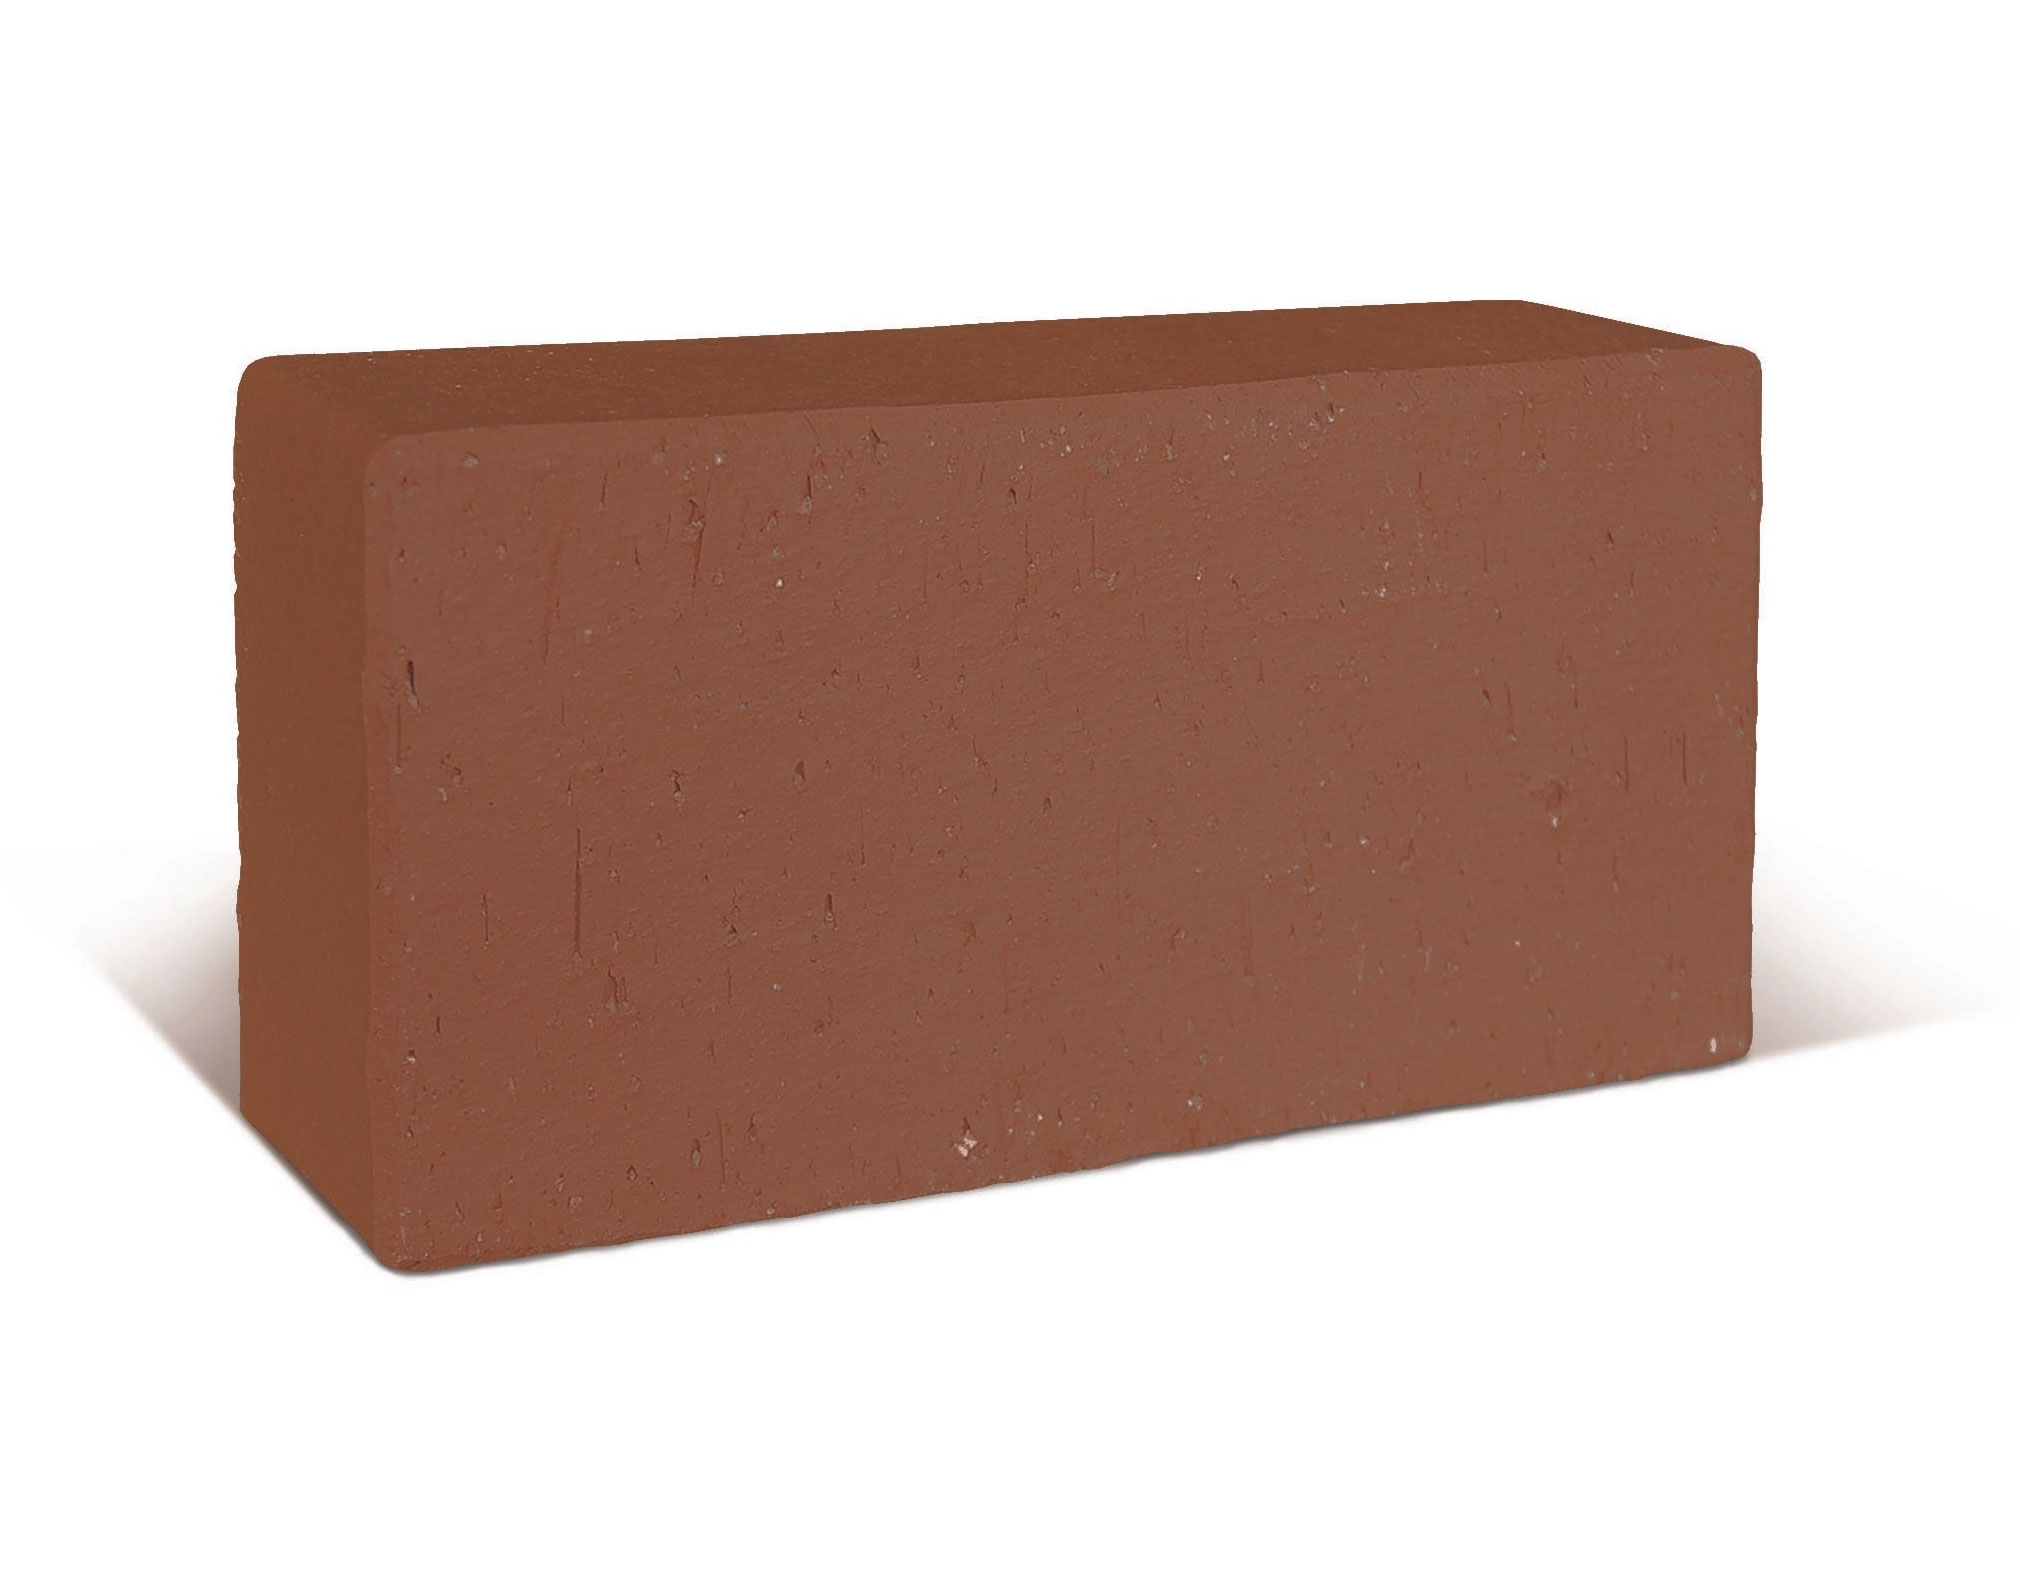 Плитка тротуарная клинкерная 200х100х50 мм  тёмно-красная флешинг